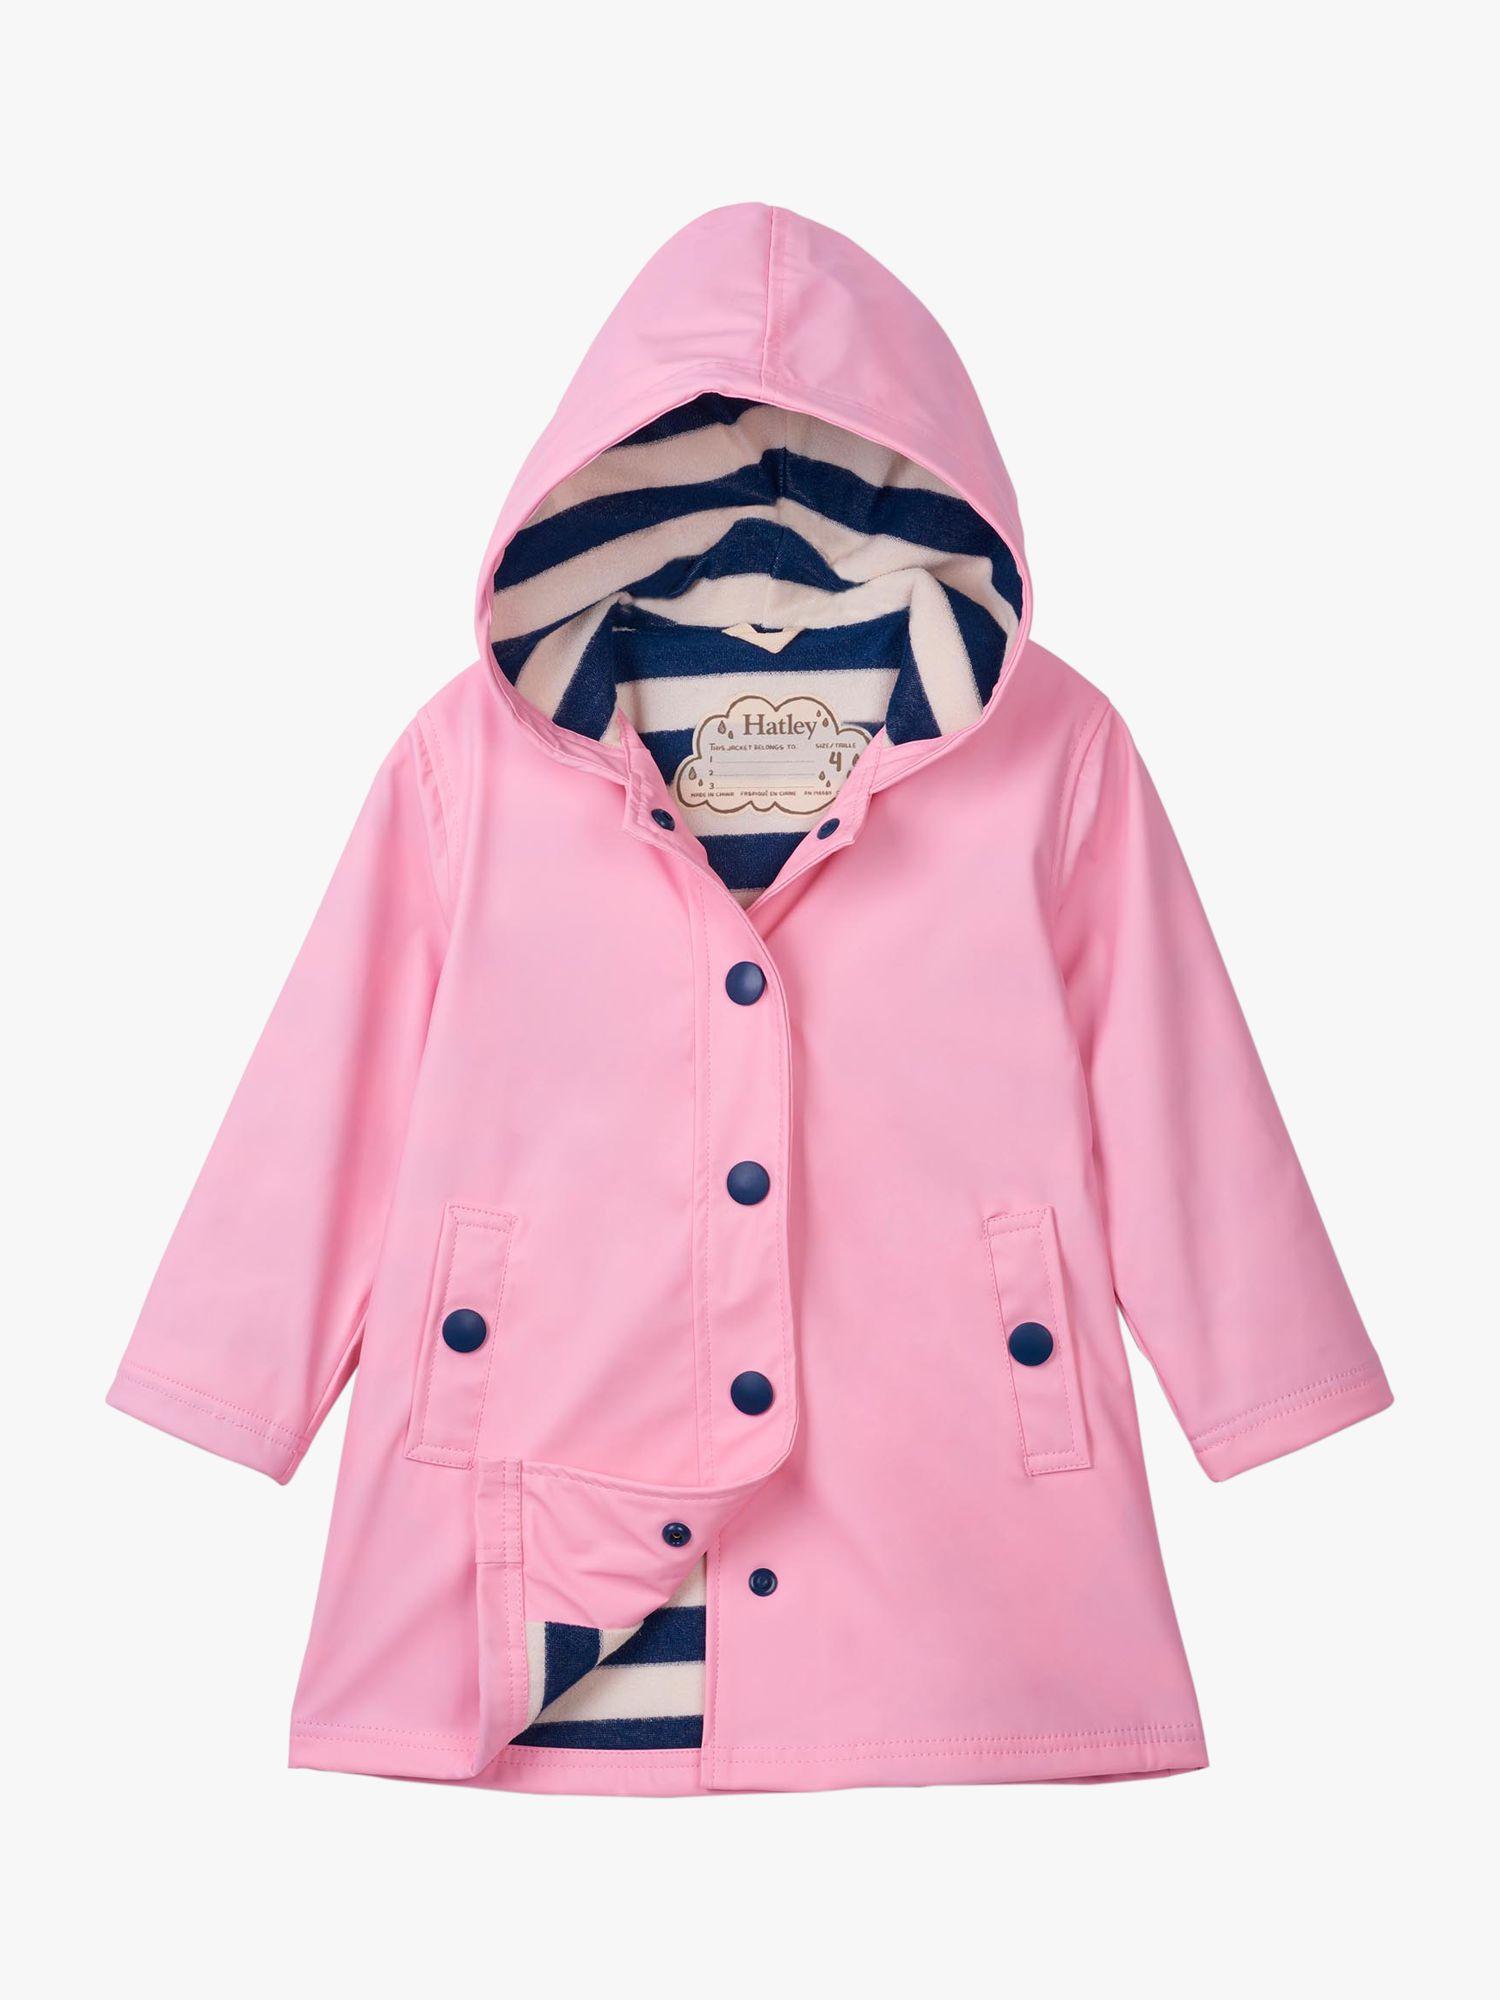 Hatley Girls Splash Jacket